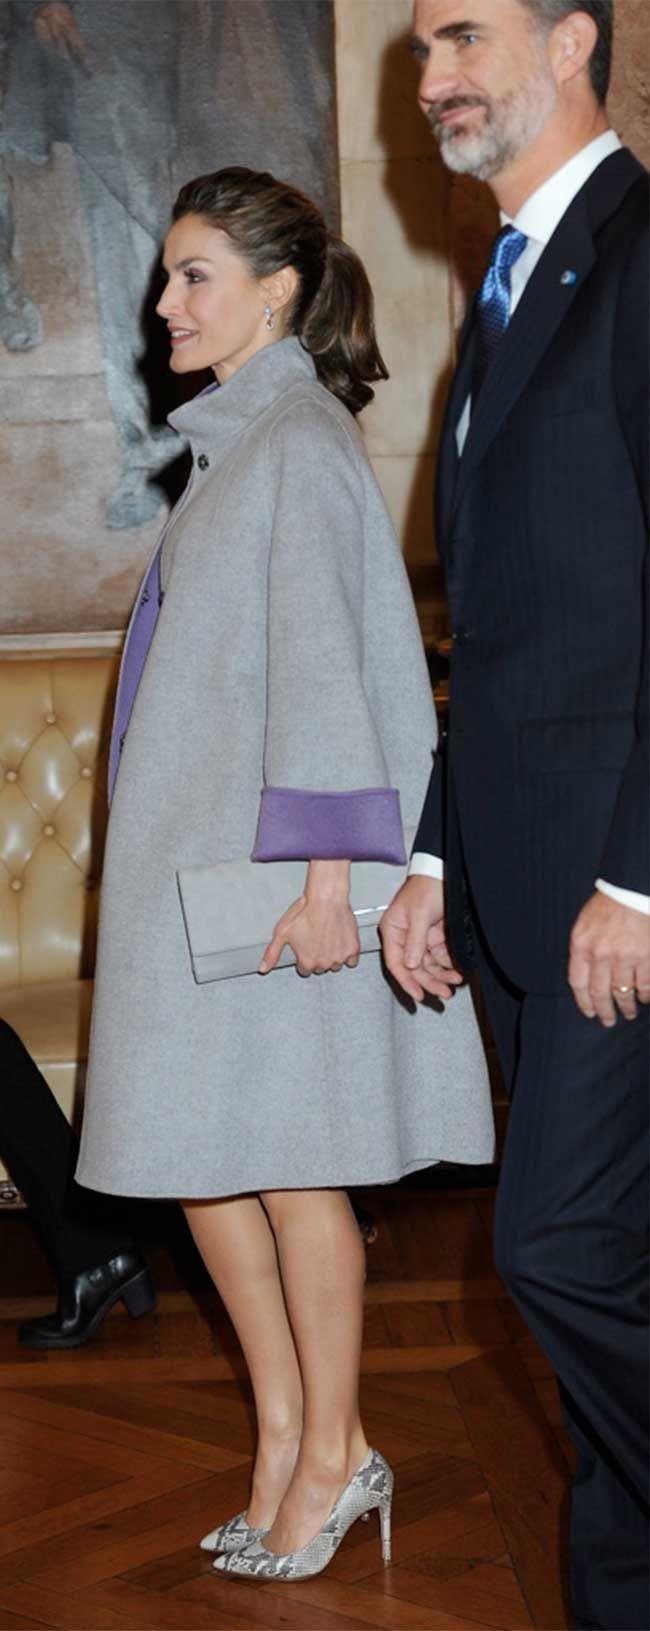 Los Reyes Felipe VI & Letizia en Portugal.30.11.2016